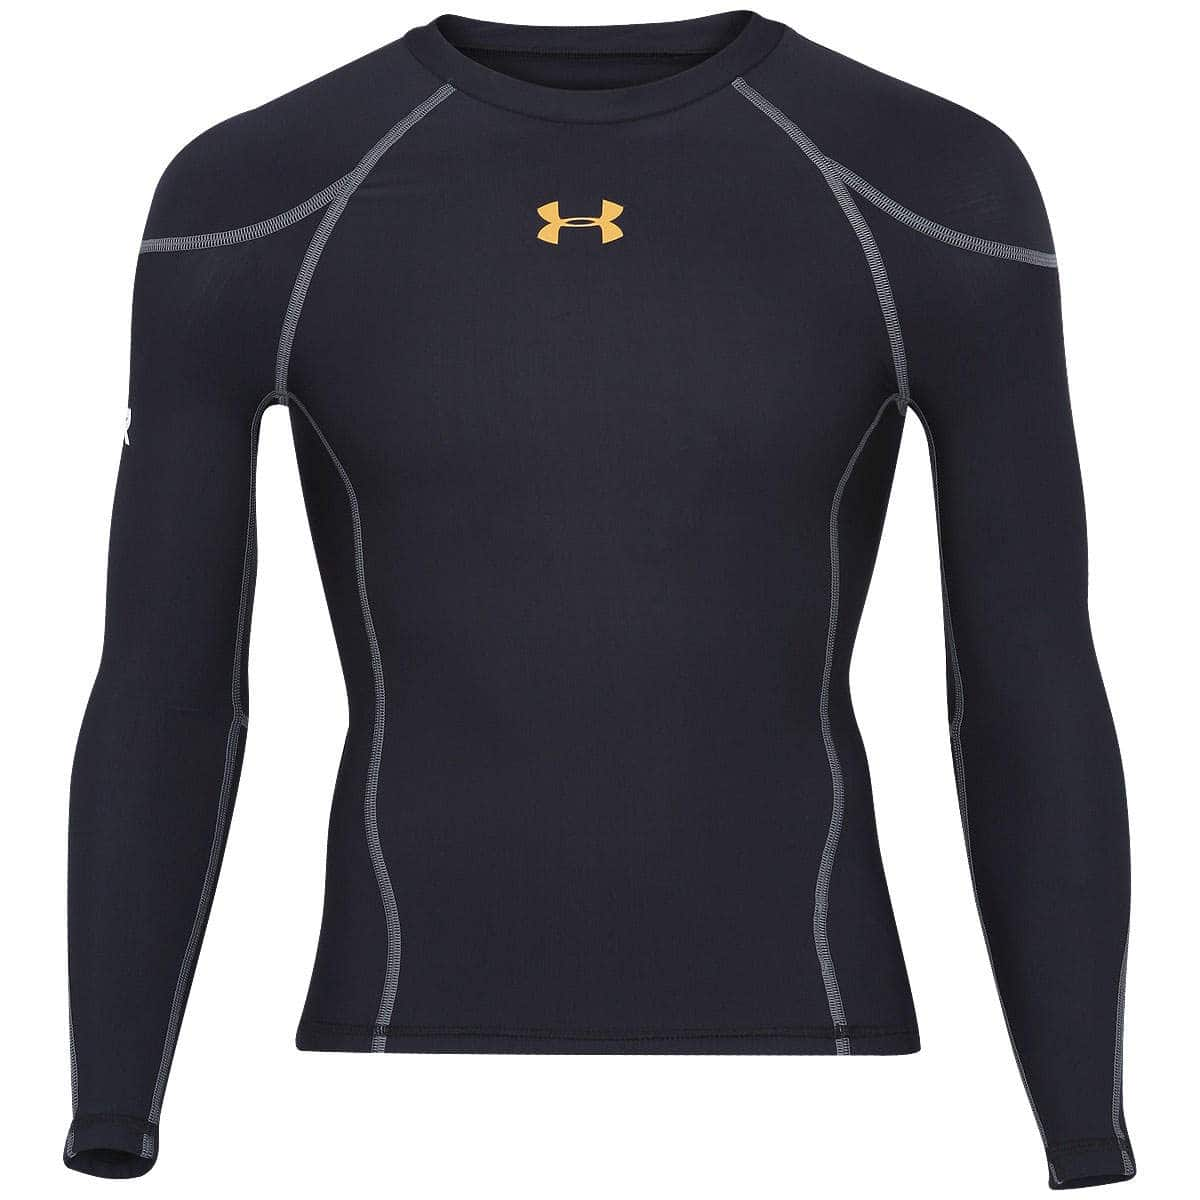 camiseta-manga-longa-compressao-under-armour-recharge-masculina